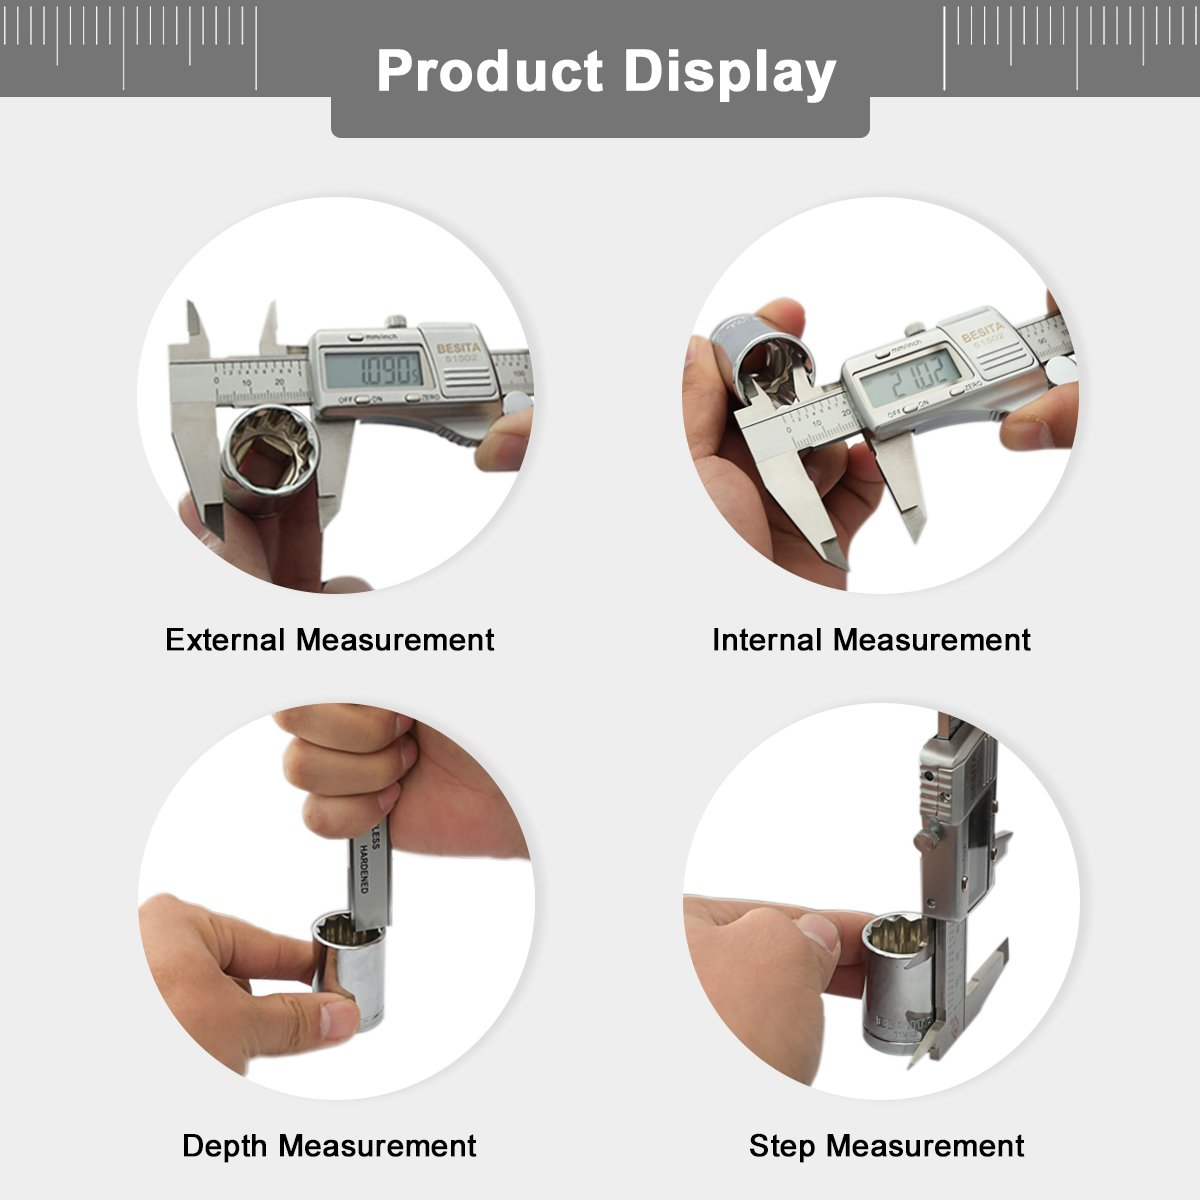 Digital Caliper with Accurate Measurement Inch/Metric ,0-6 Inch/150 mm BESITA Stainless Steel Vernier Caliper IP54 Waterproof Electronic Measuring Tool by BESITA (Image #2)